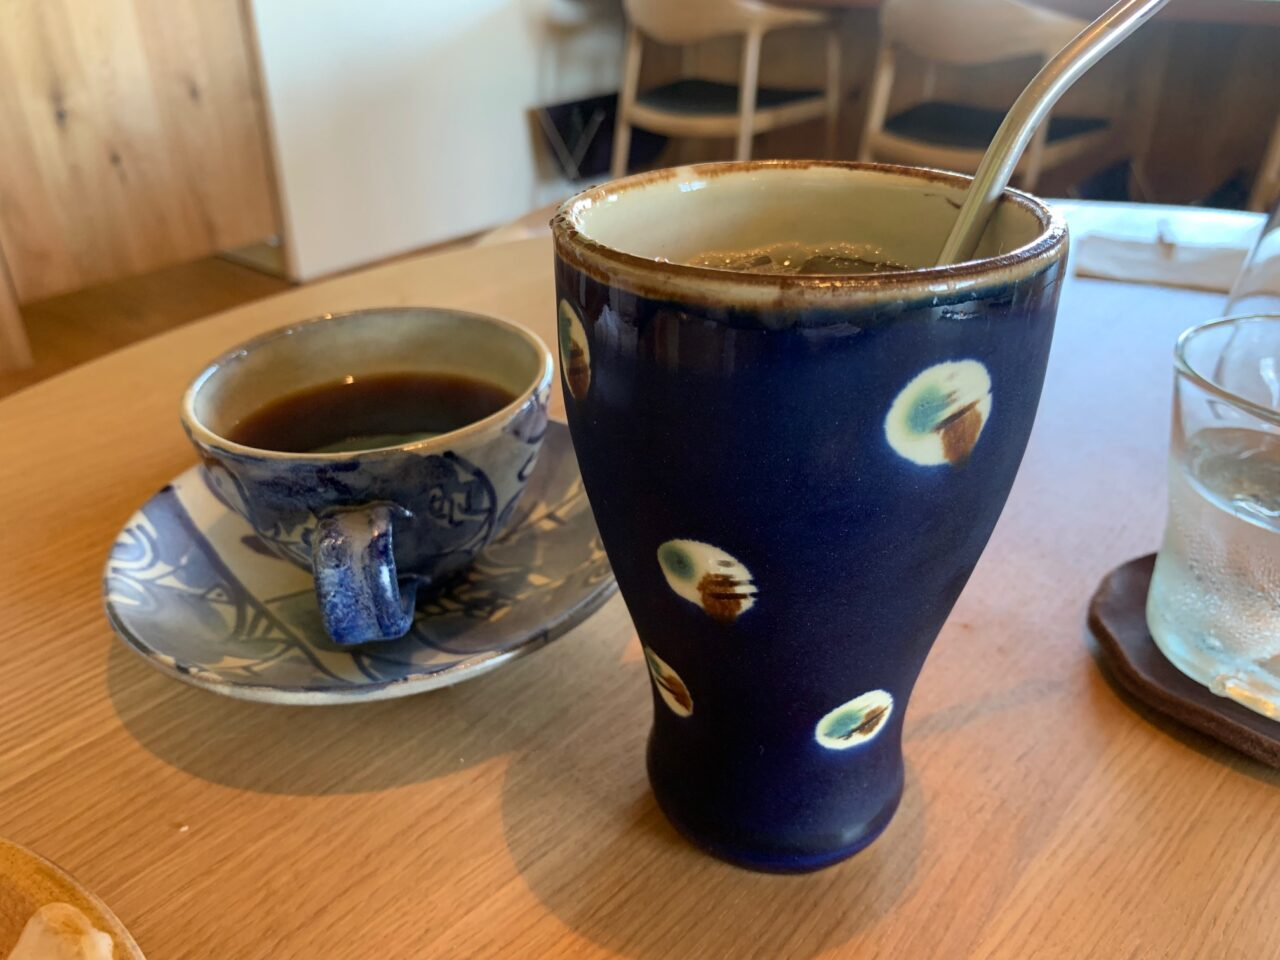 nissin-haijme-coffee